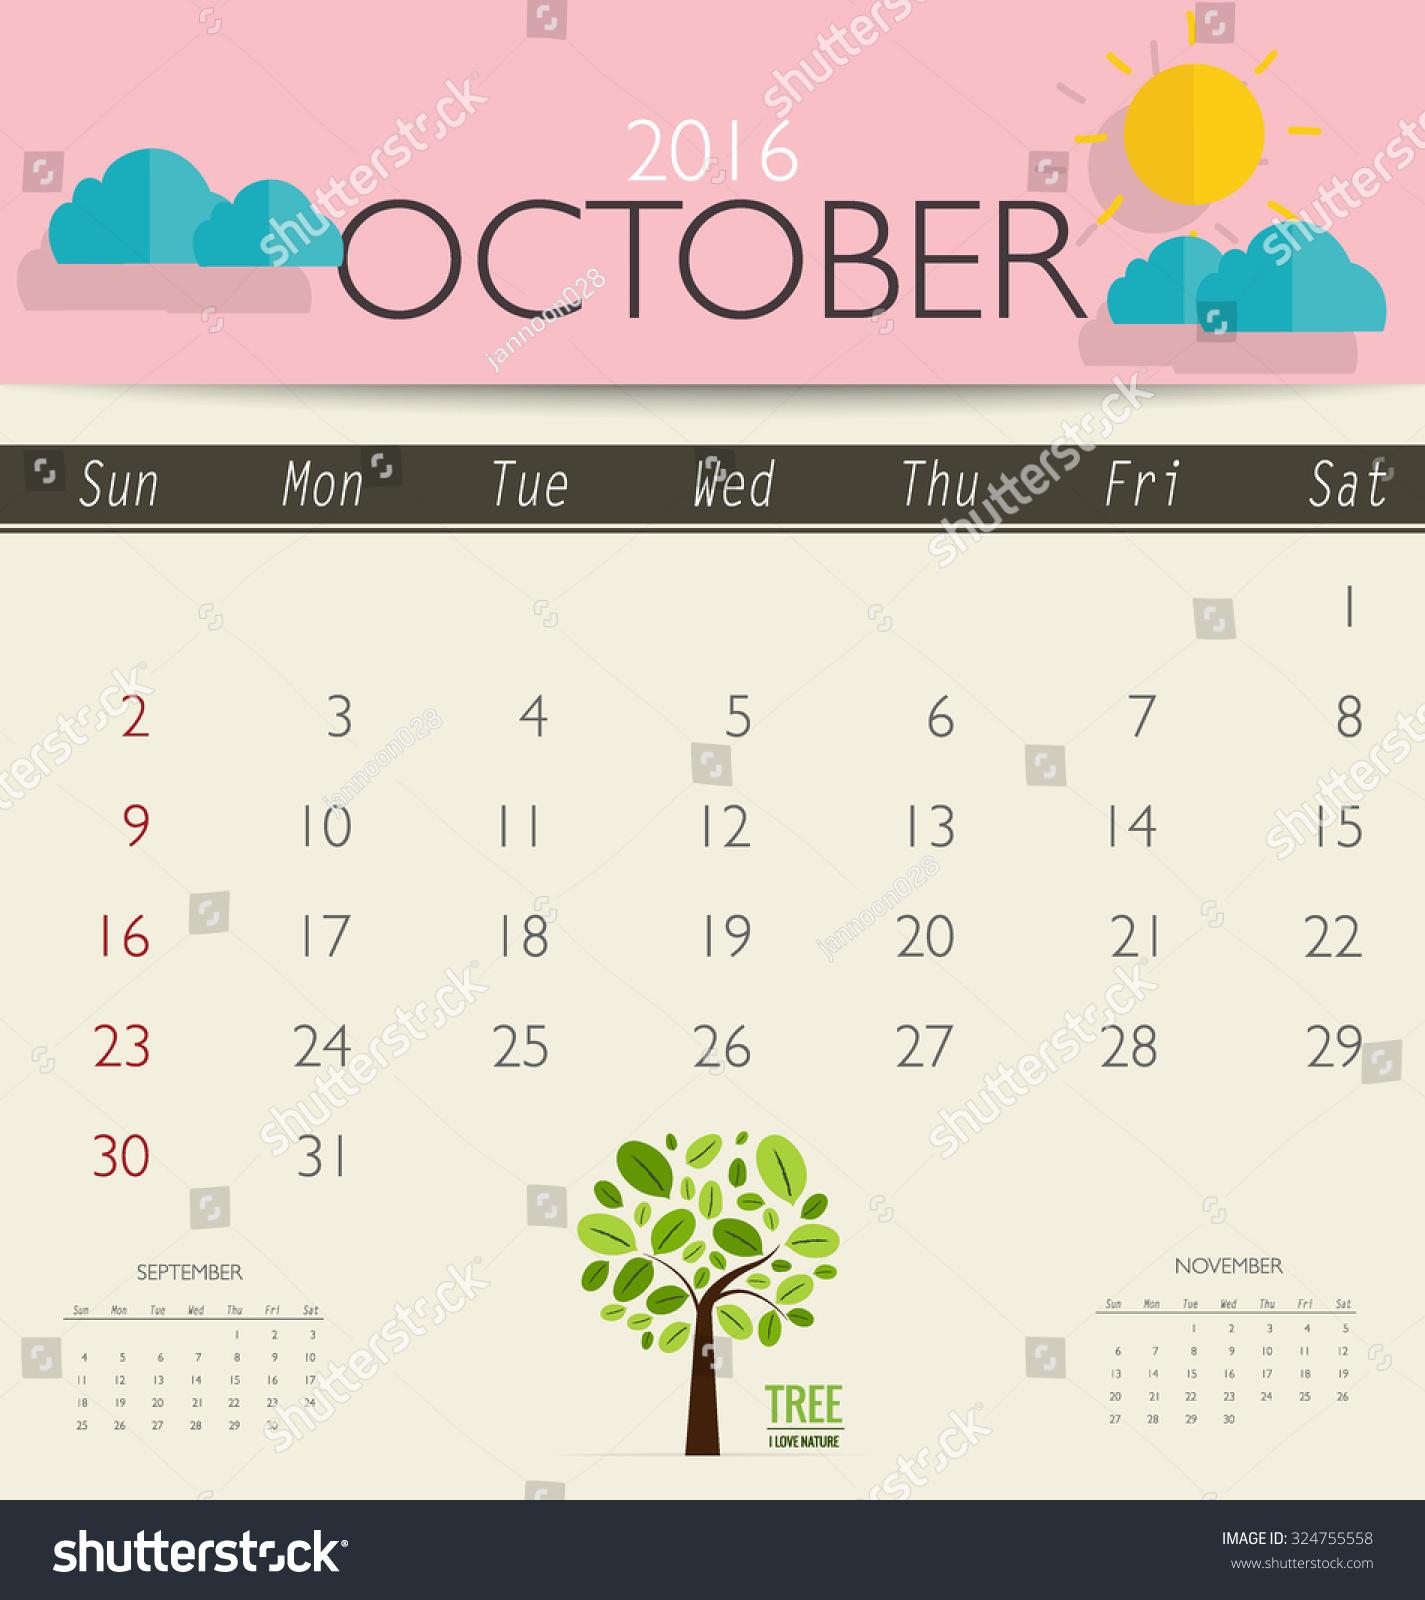 October Calendar Illustration : Calendar monthly template for october